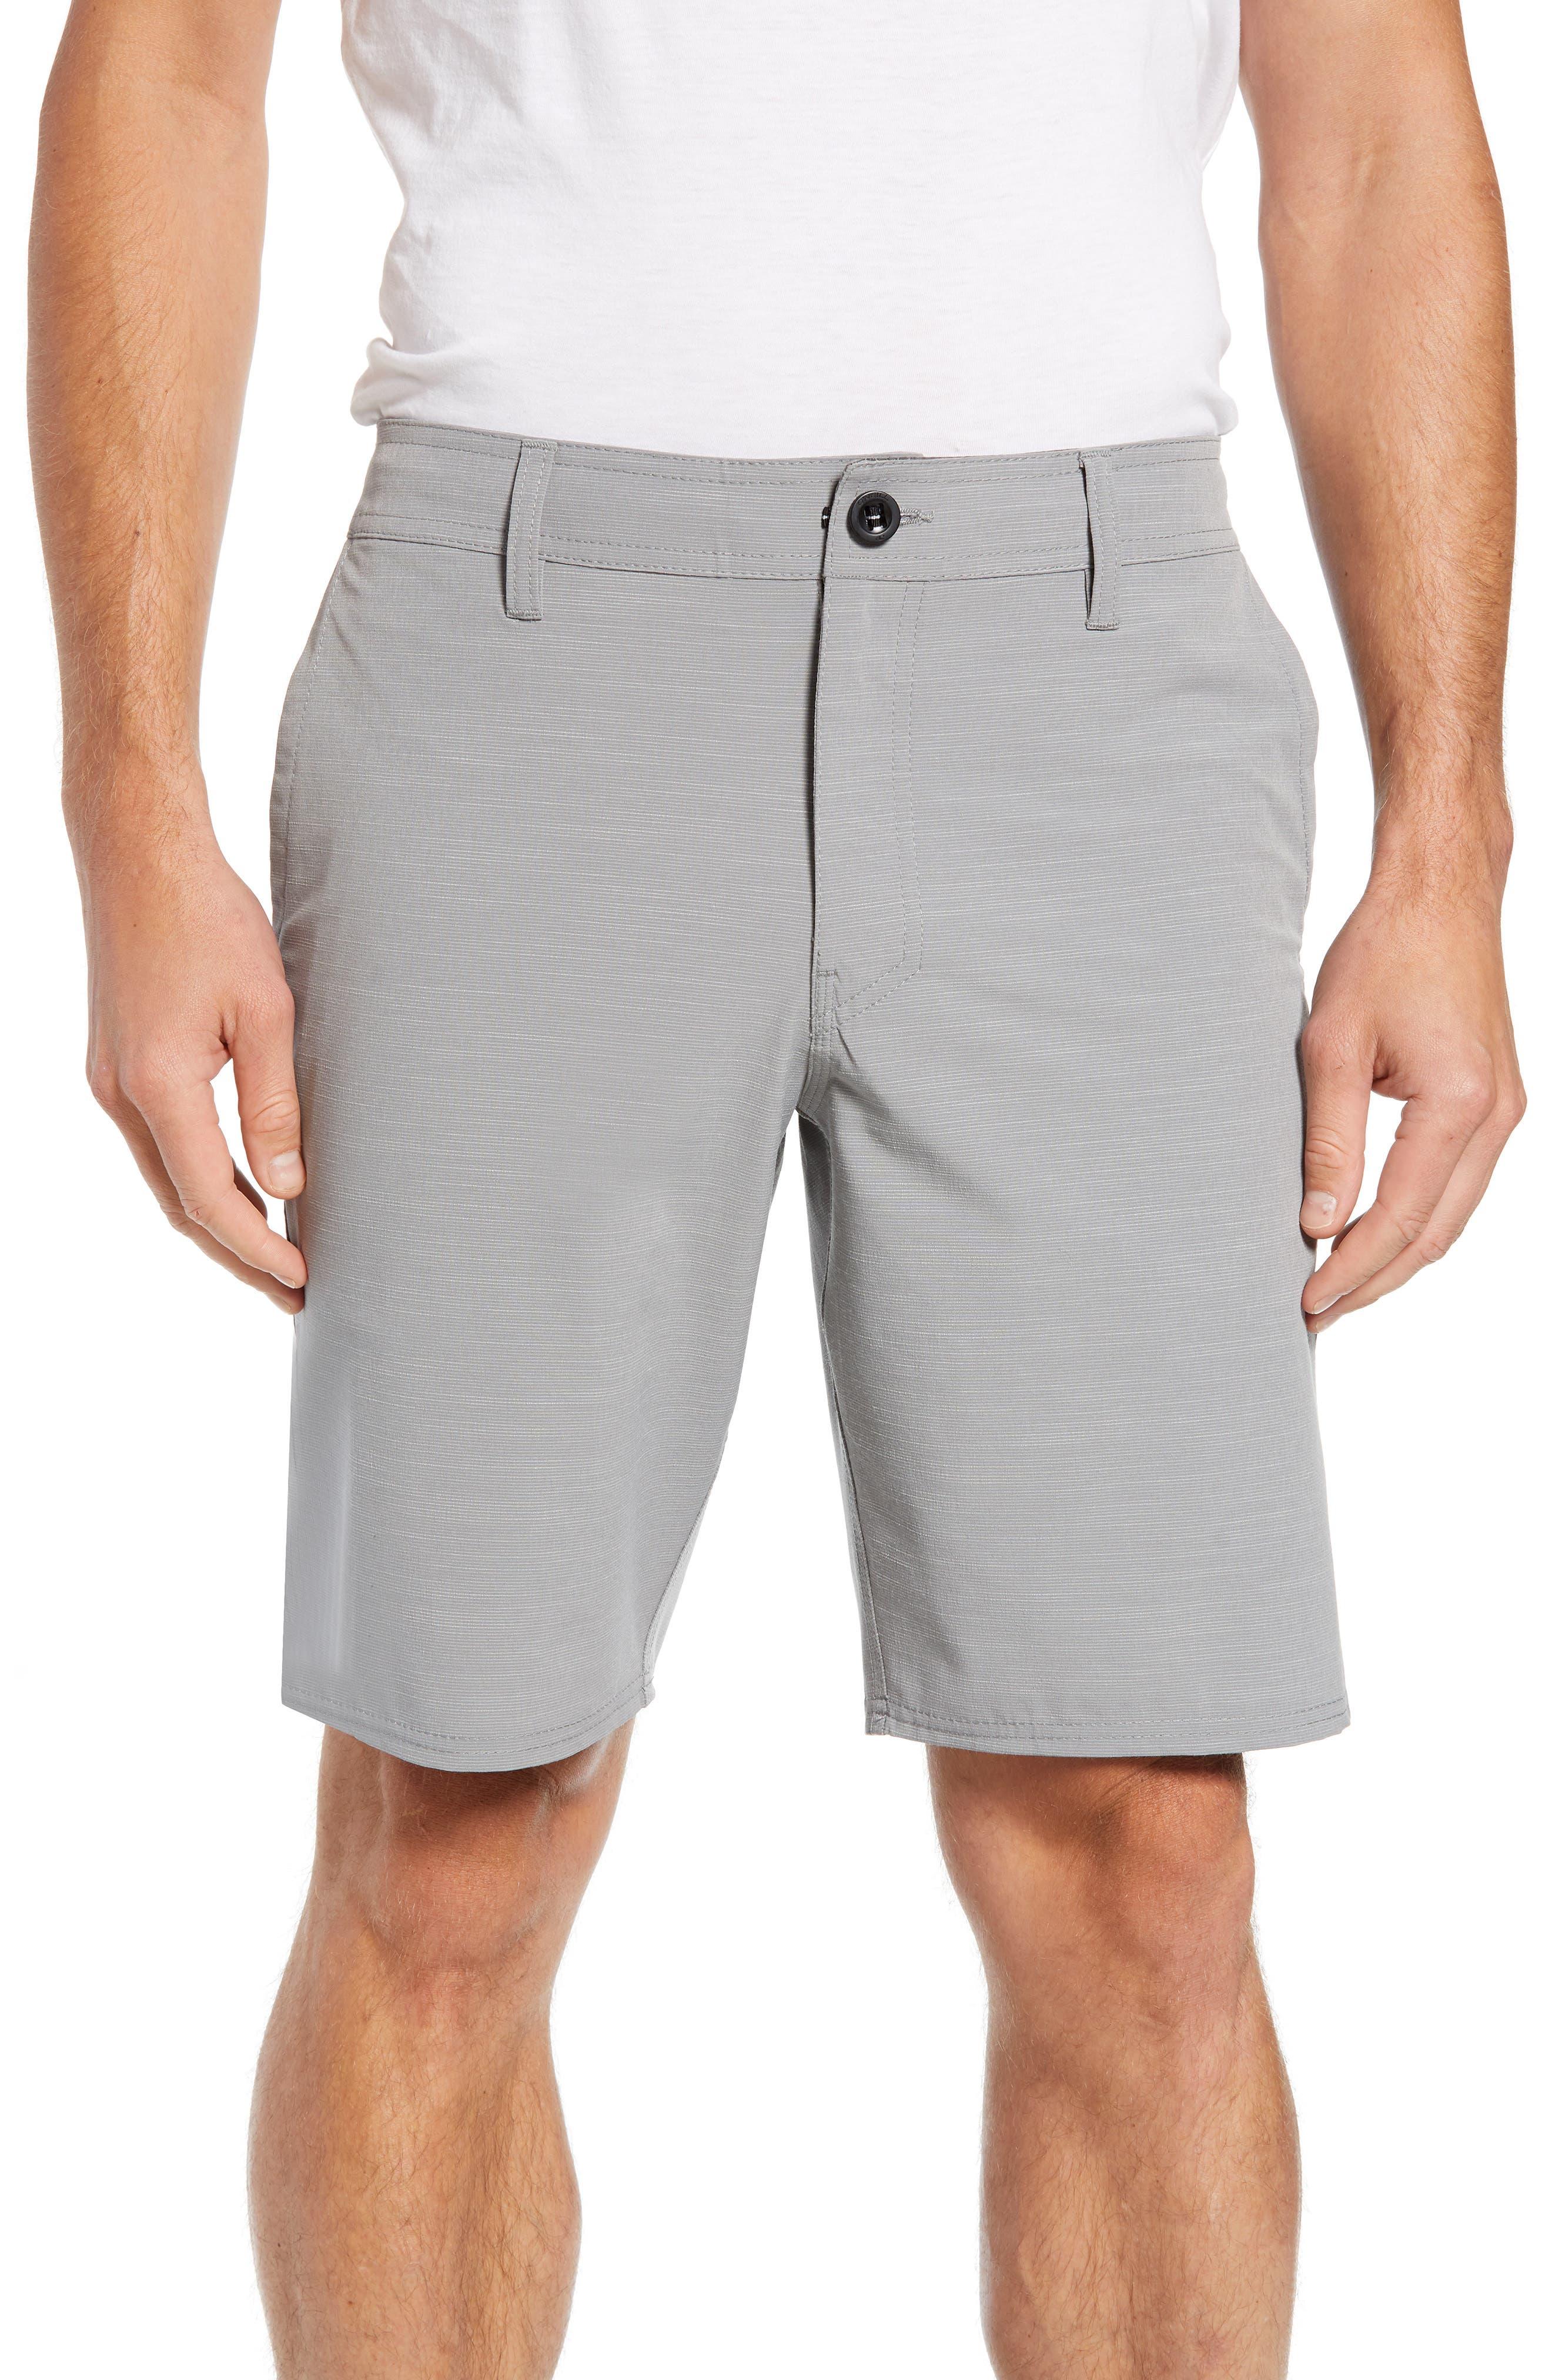 Locked Slub Hybrid Shorts,                             Main thumbnail 1, color,                             039